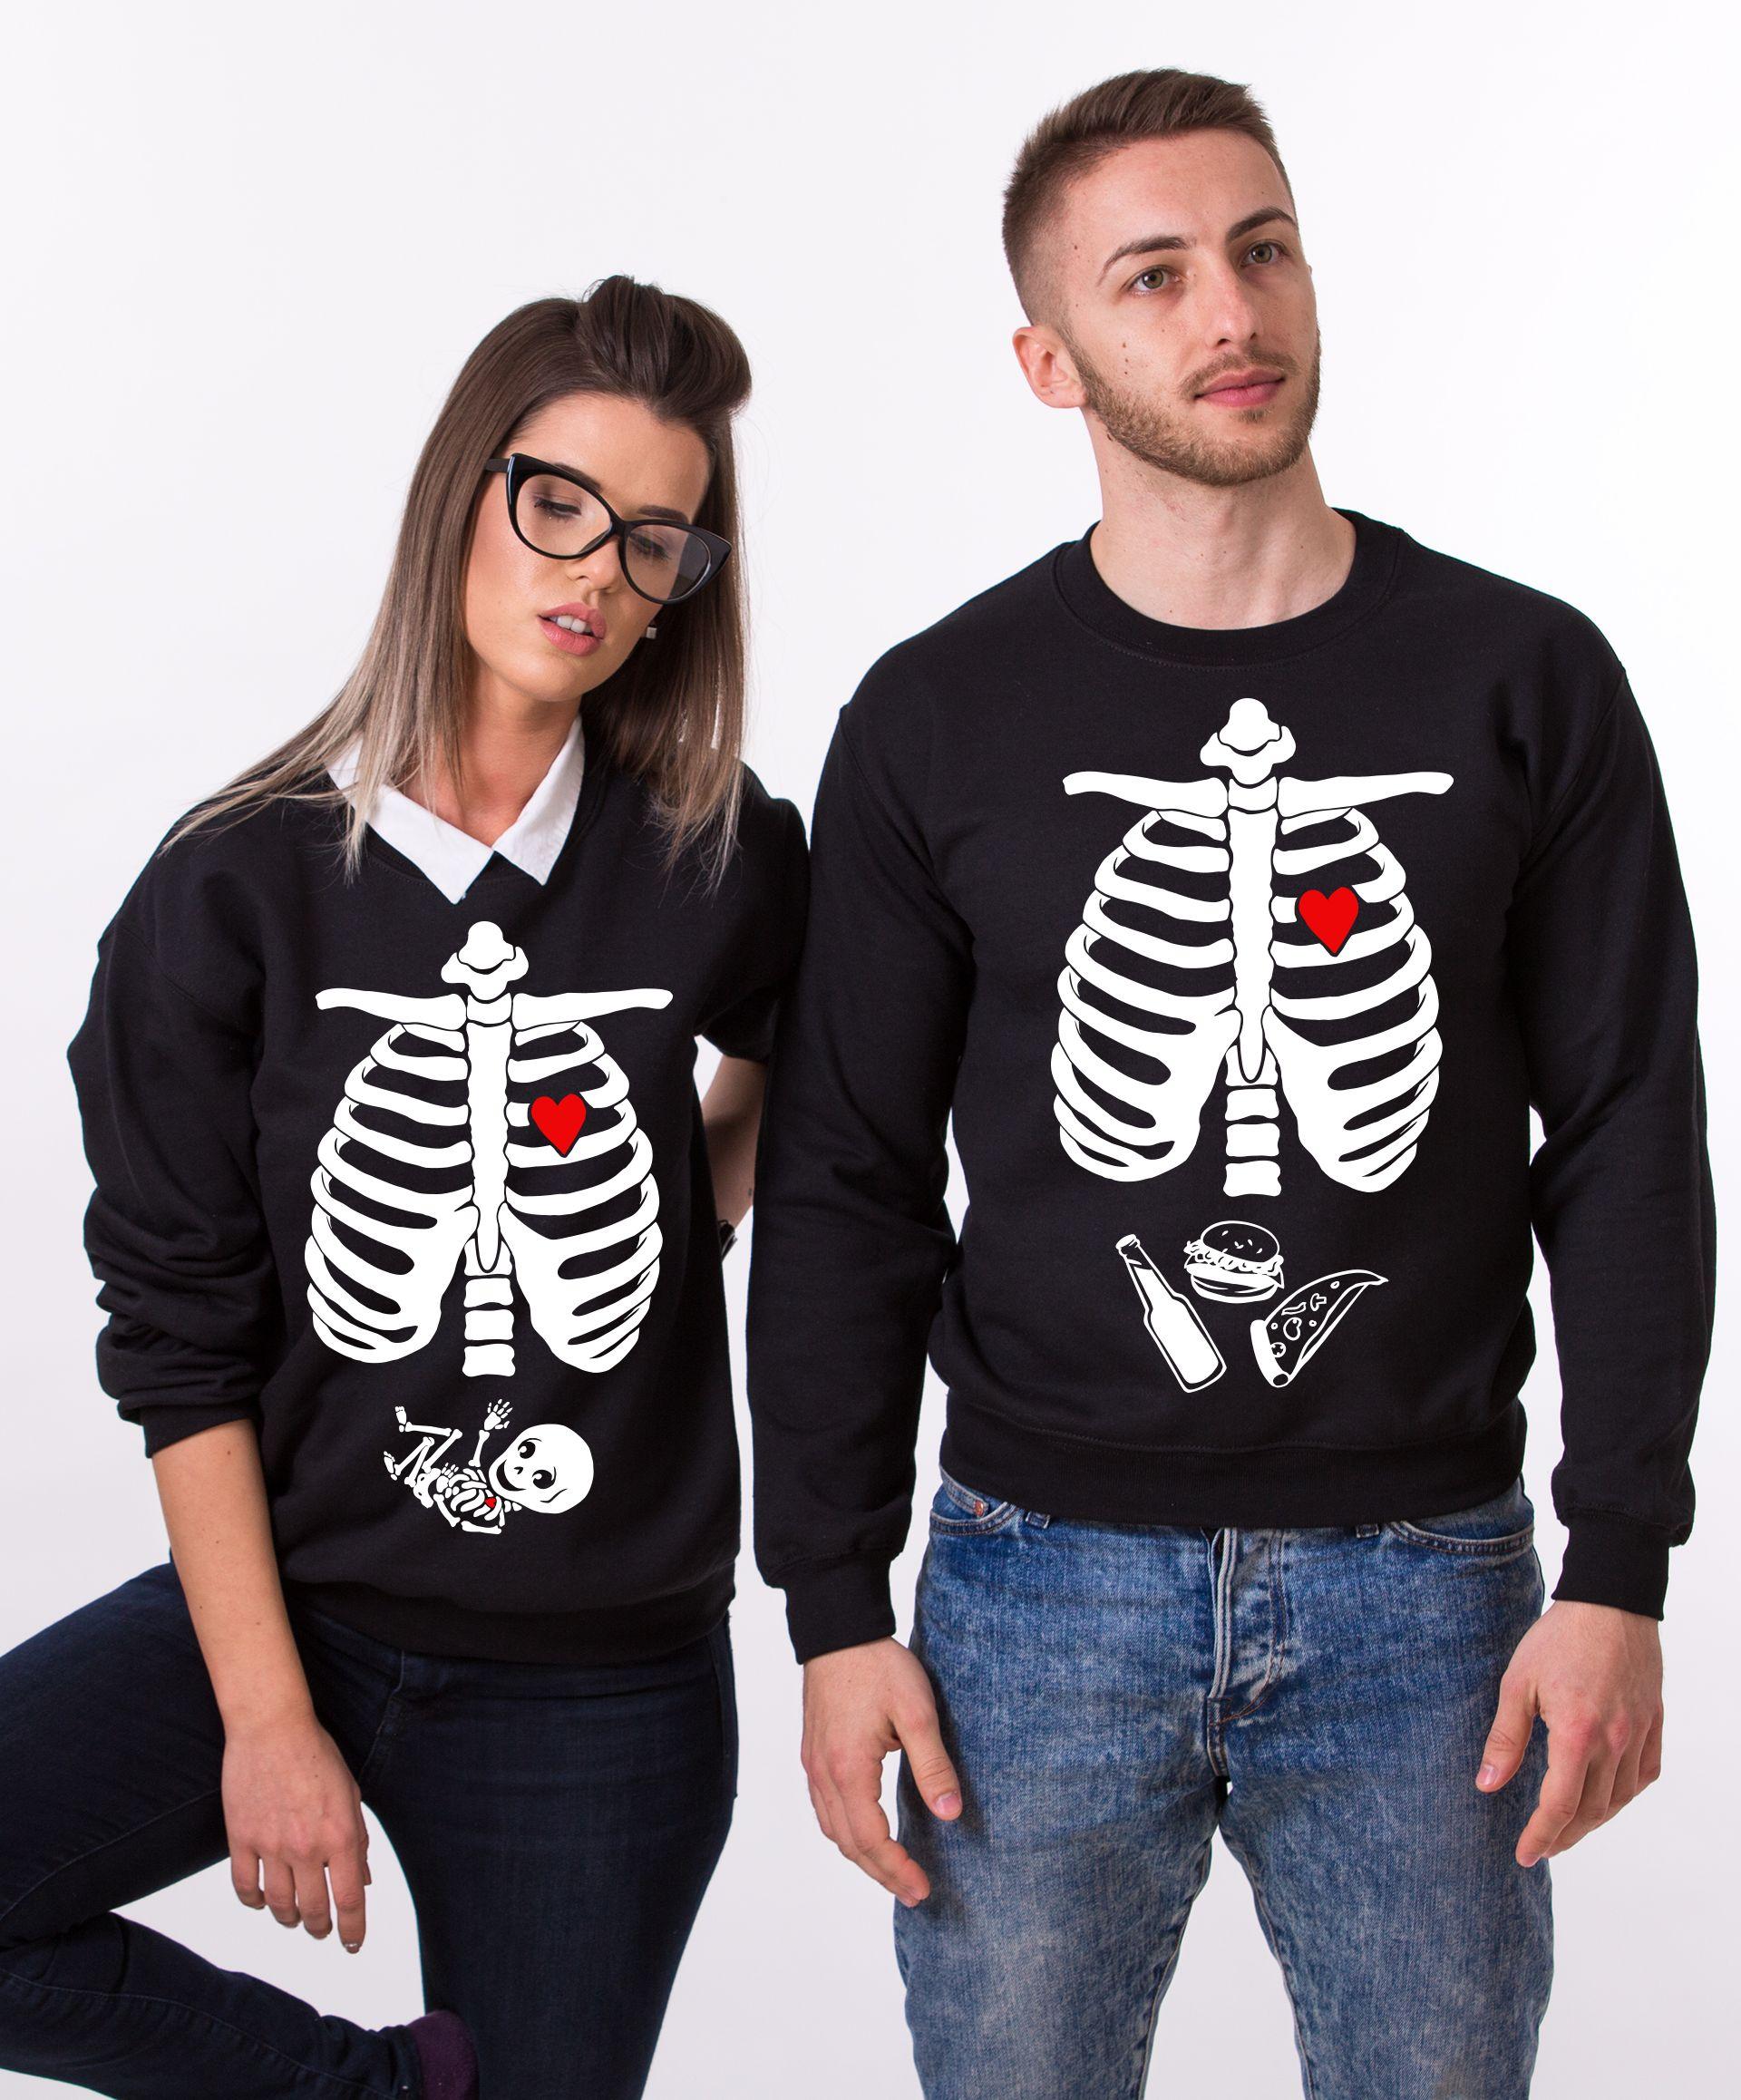 baby skeleton shirt ✓ labzada t shirt